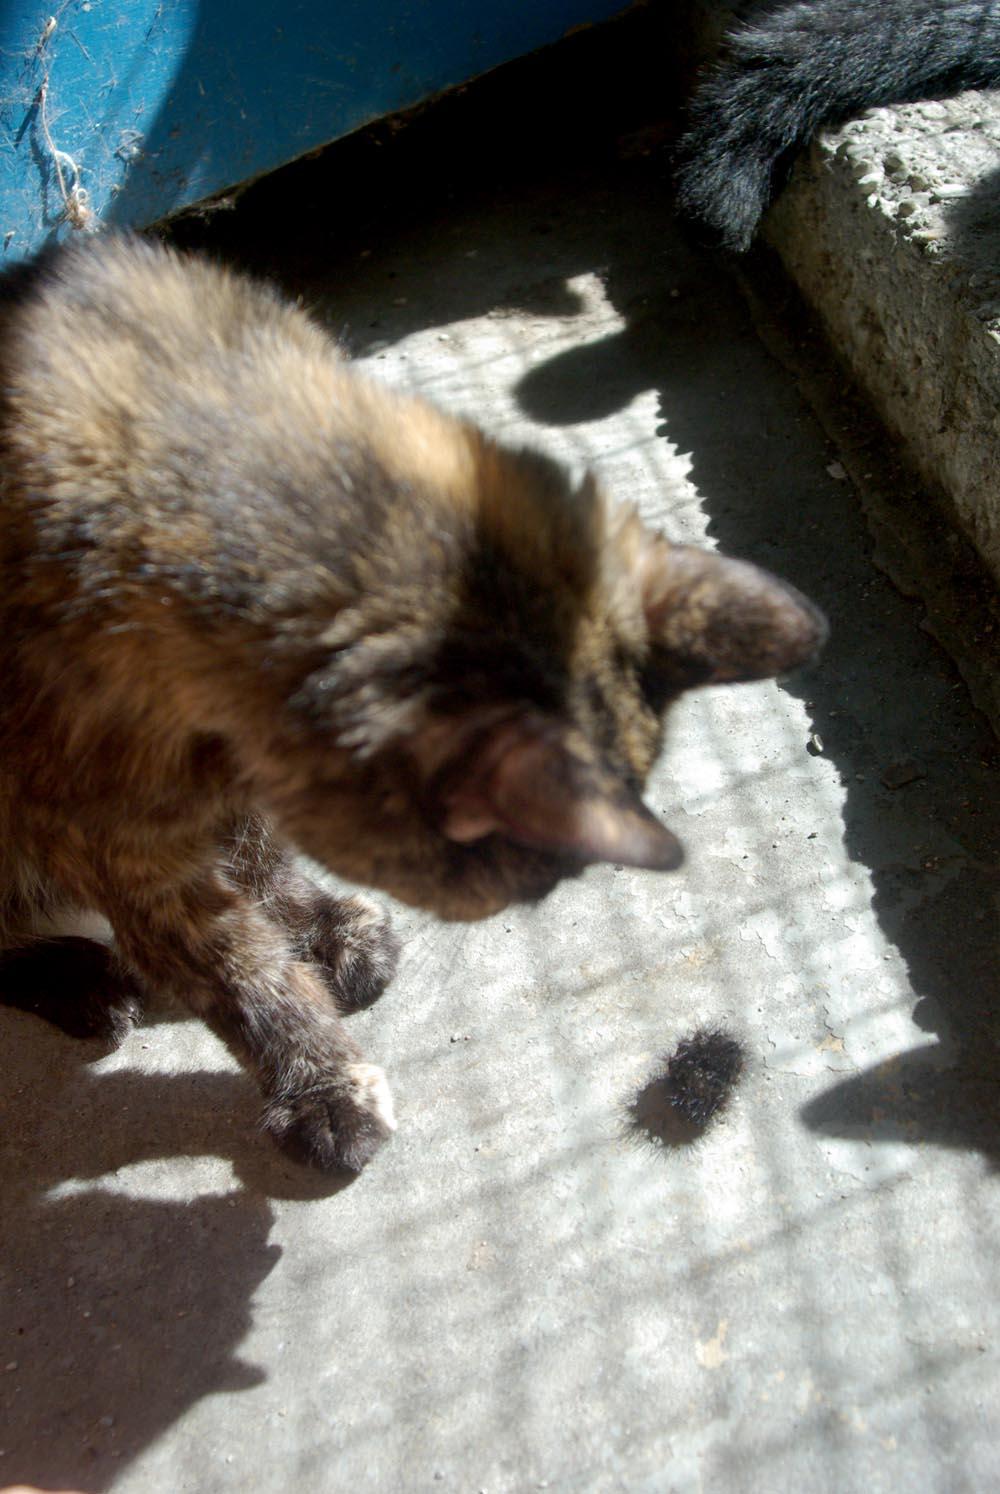 tortie cat looking at caterpillar